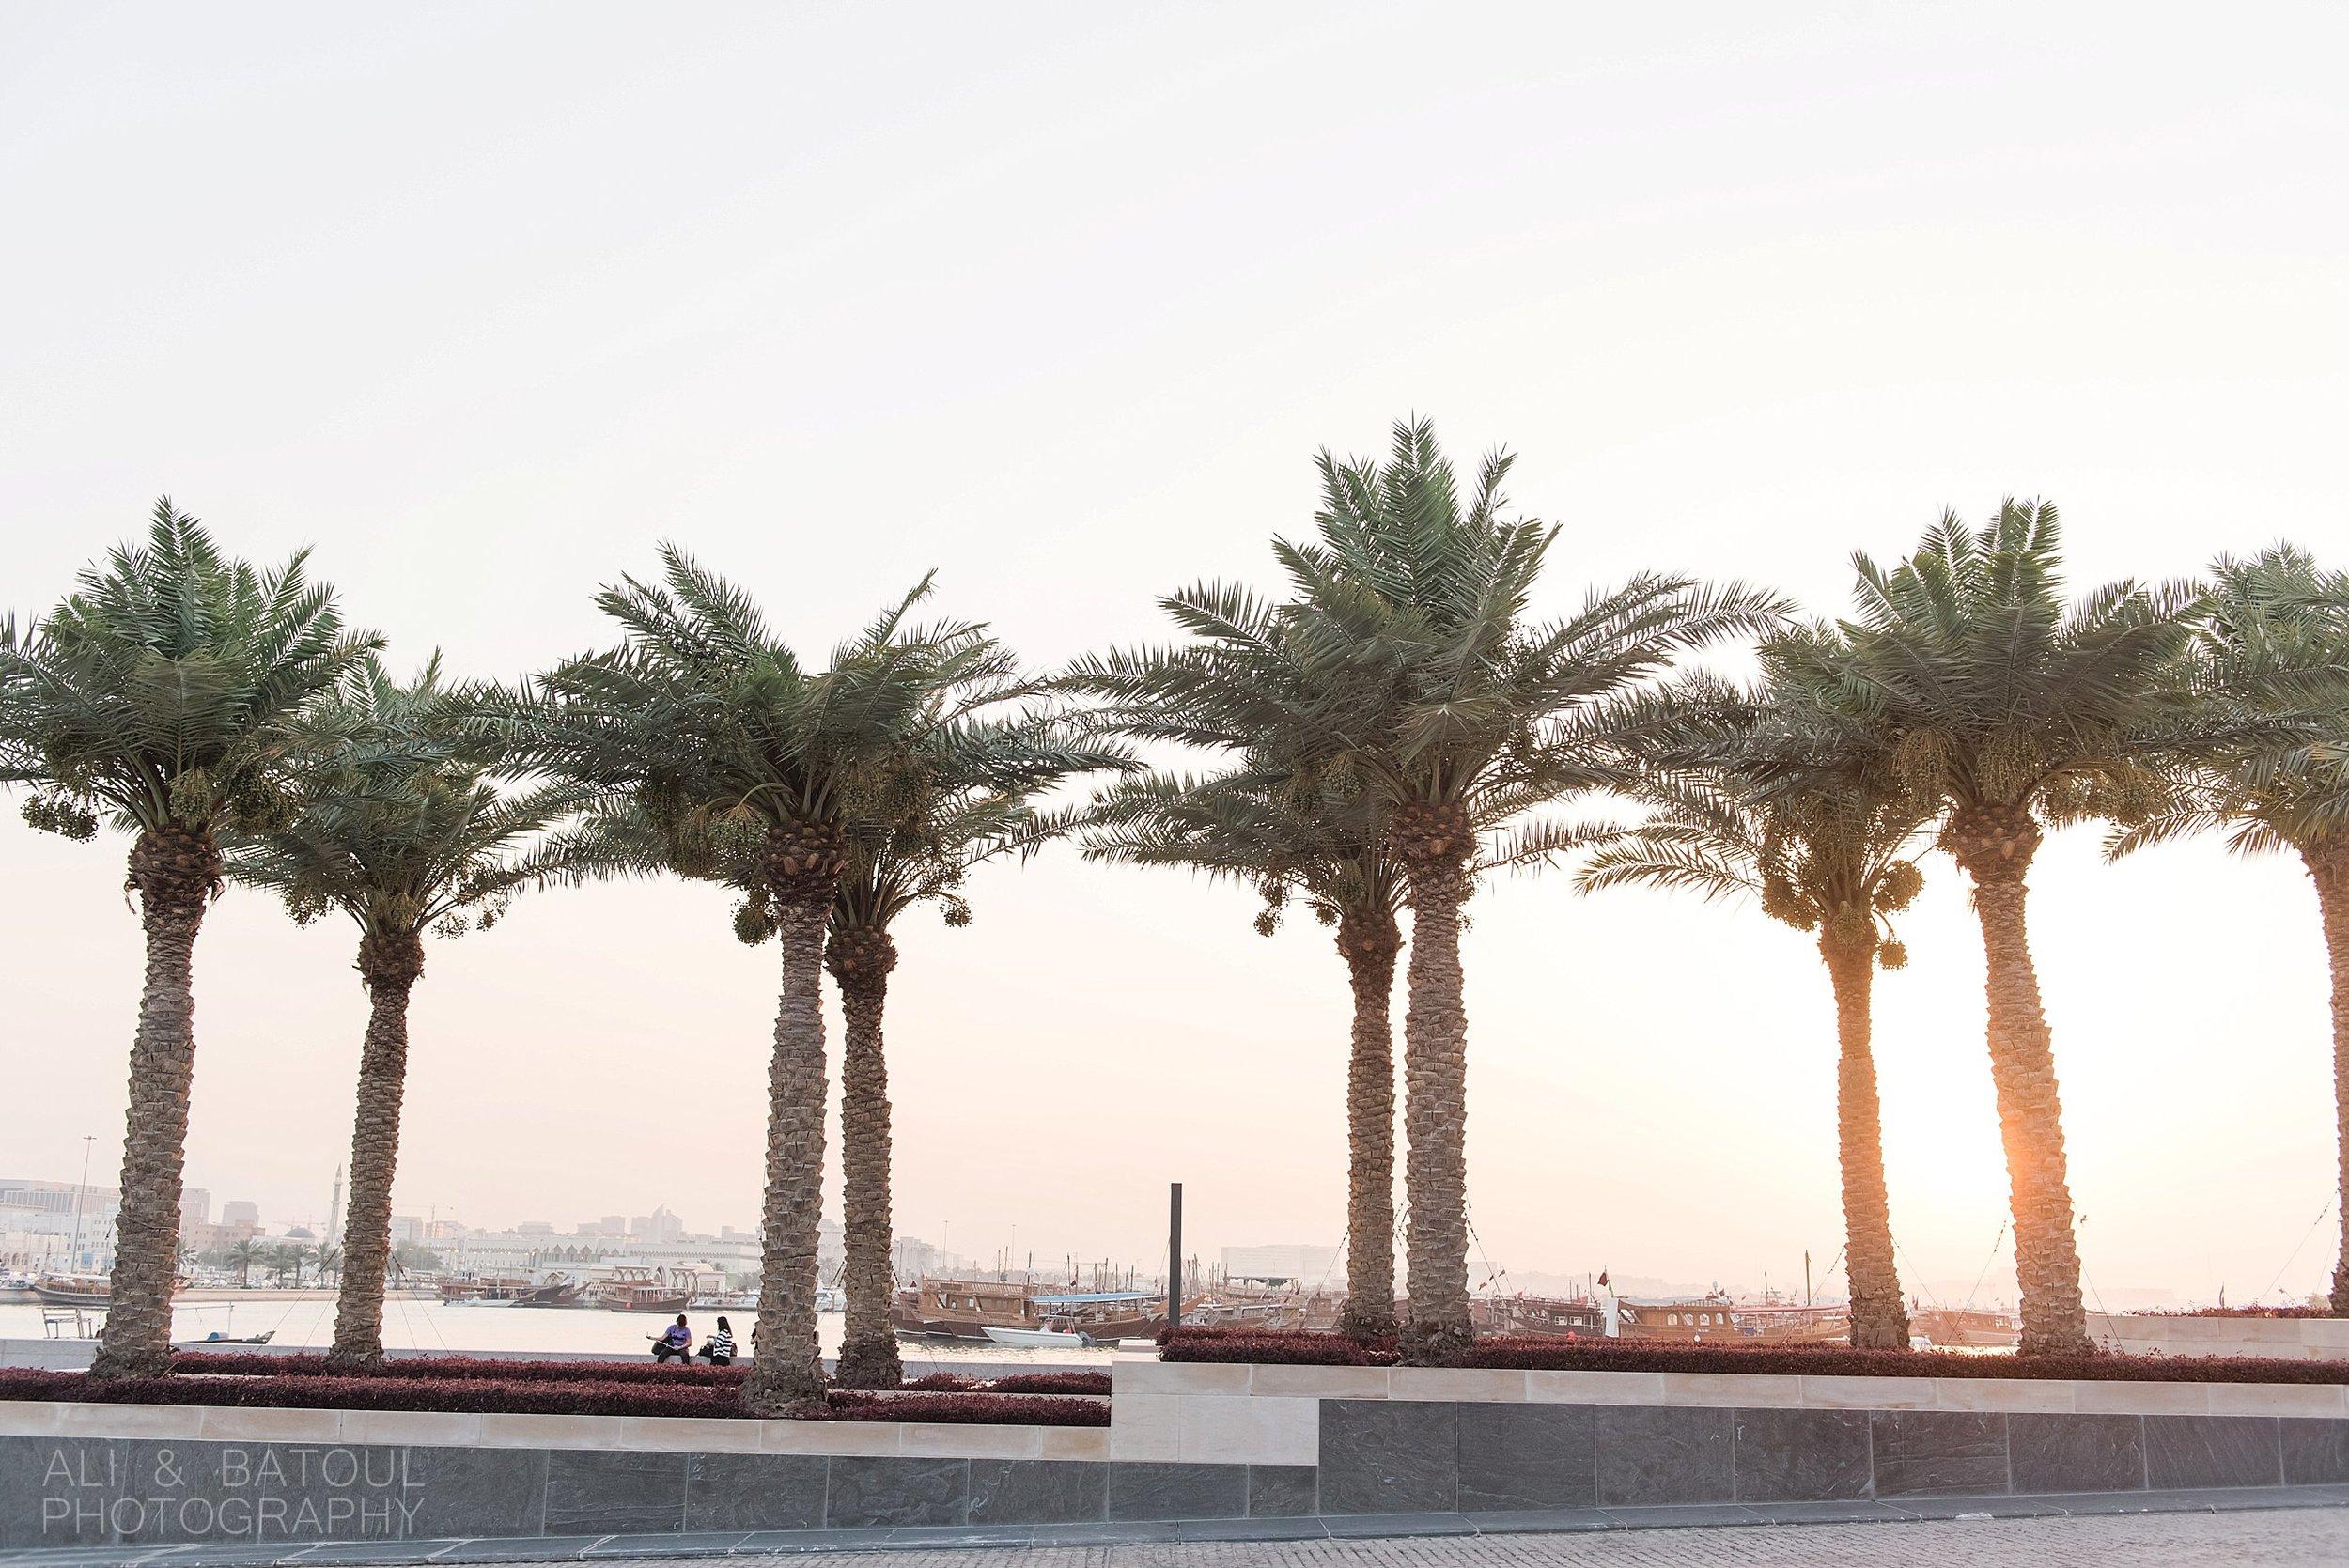 Ali & Batoul Photography - Doha Travel Photography_0003.jpg